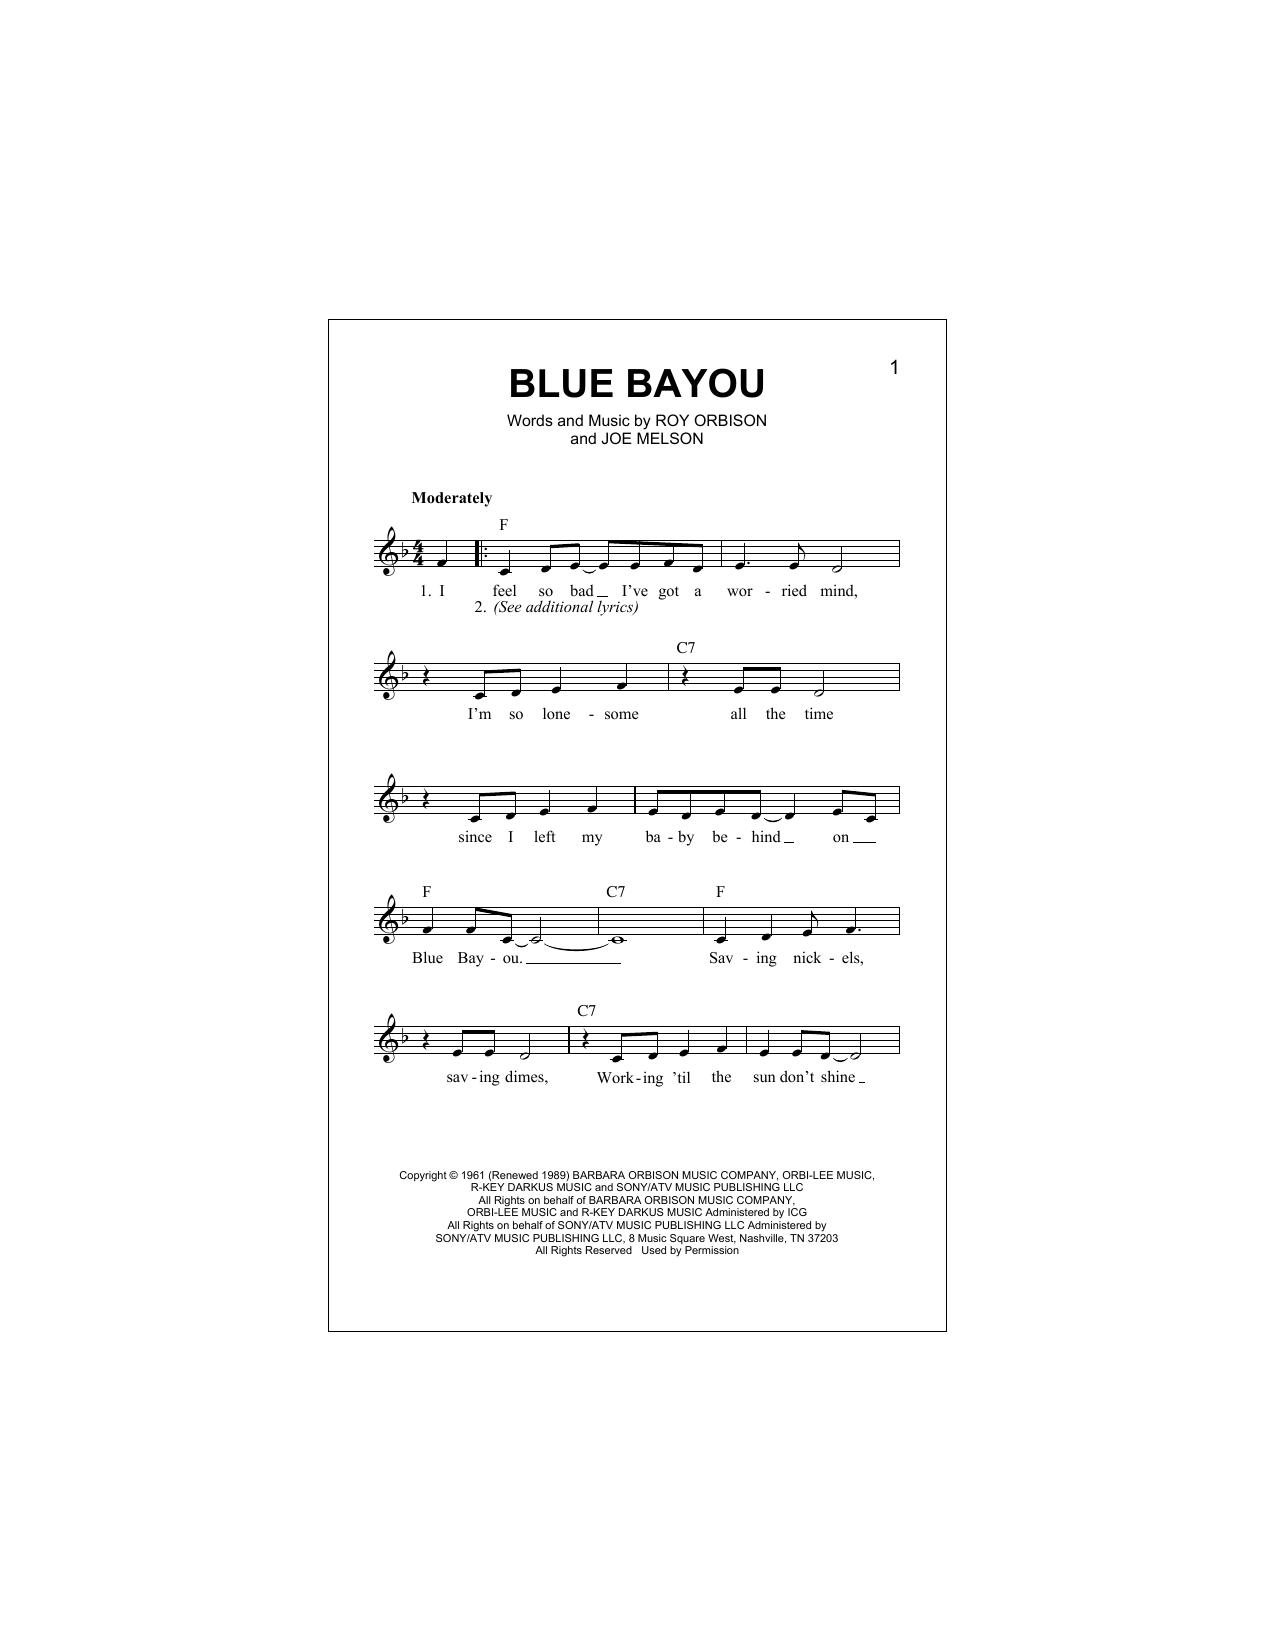 Blue Bayou Print Sheet Music Now